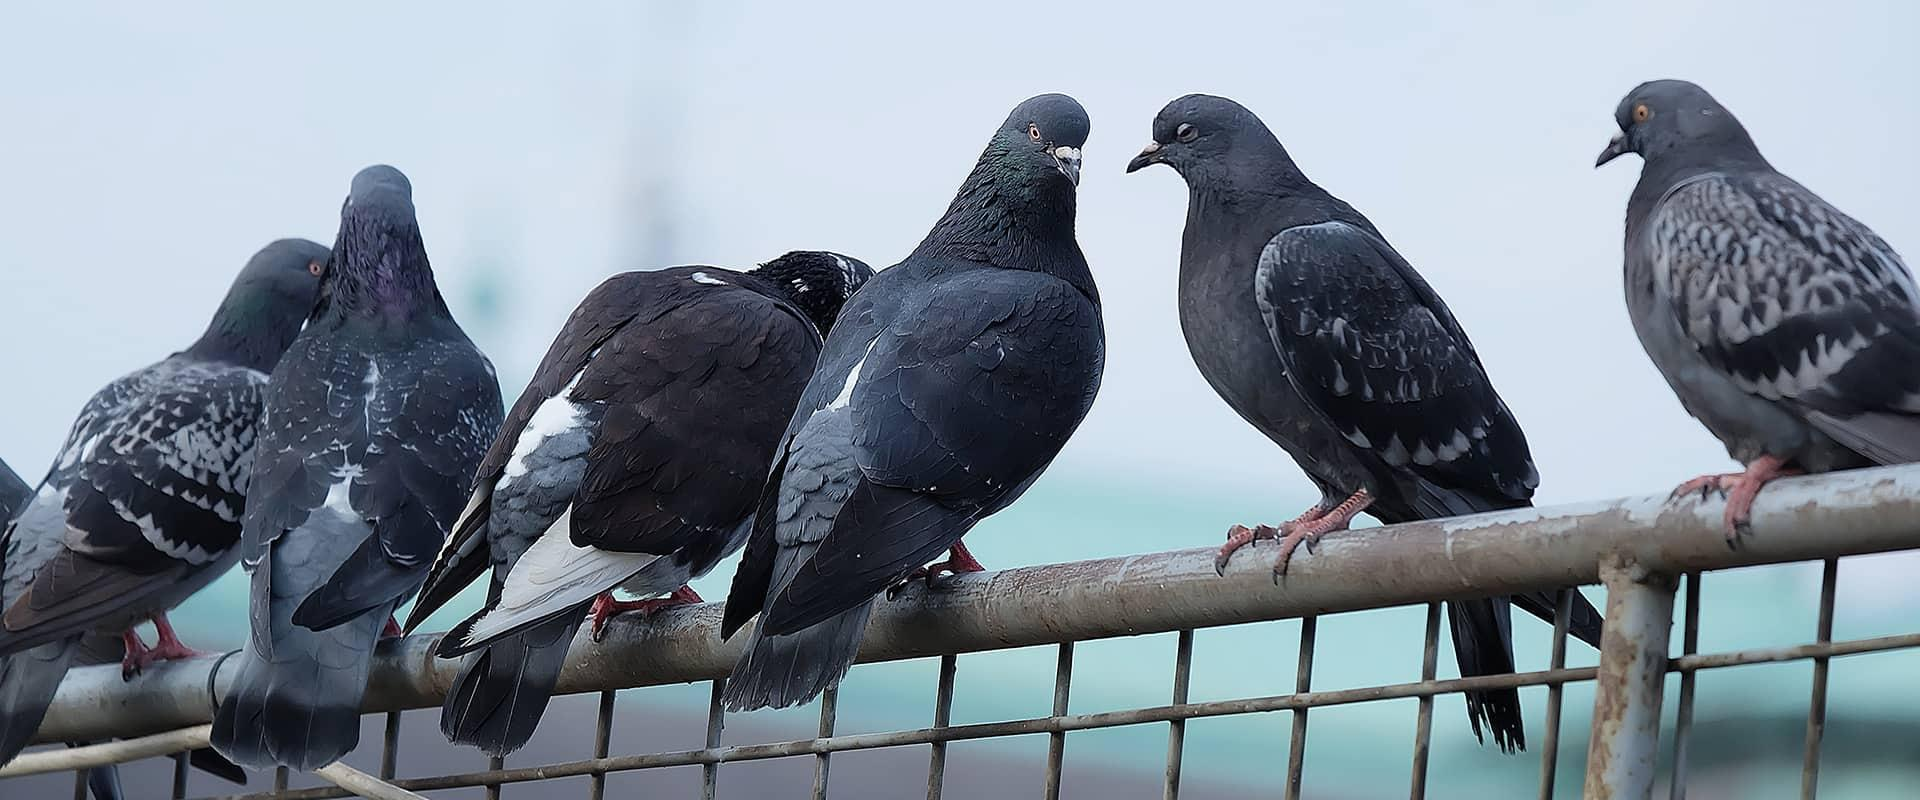 pigeons flocking on a building in auburn california